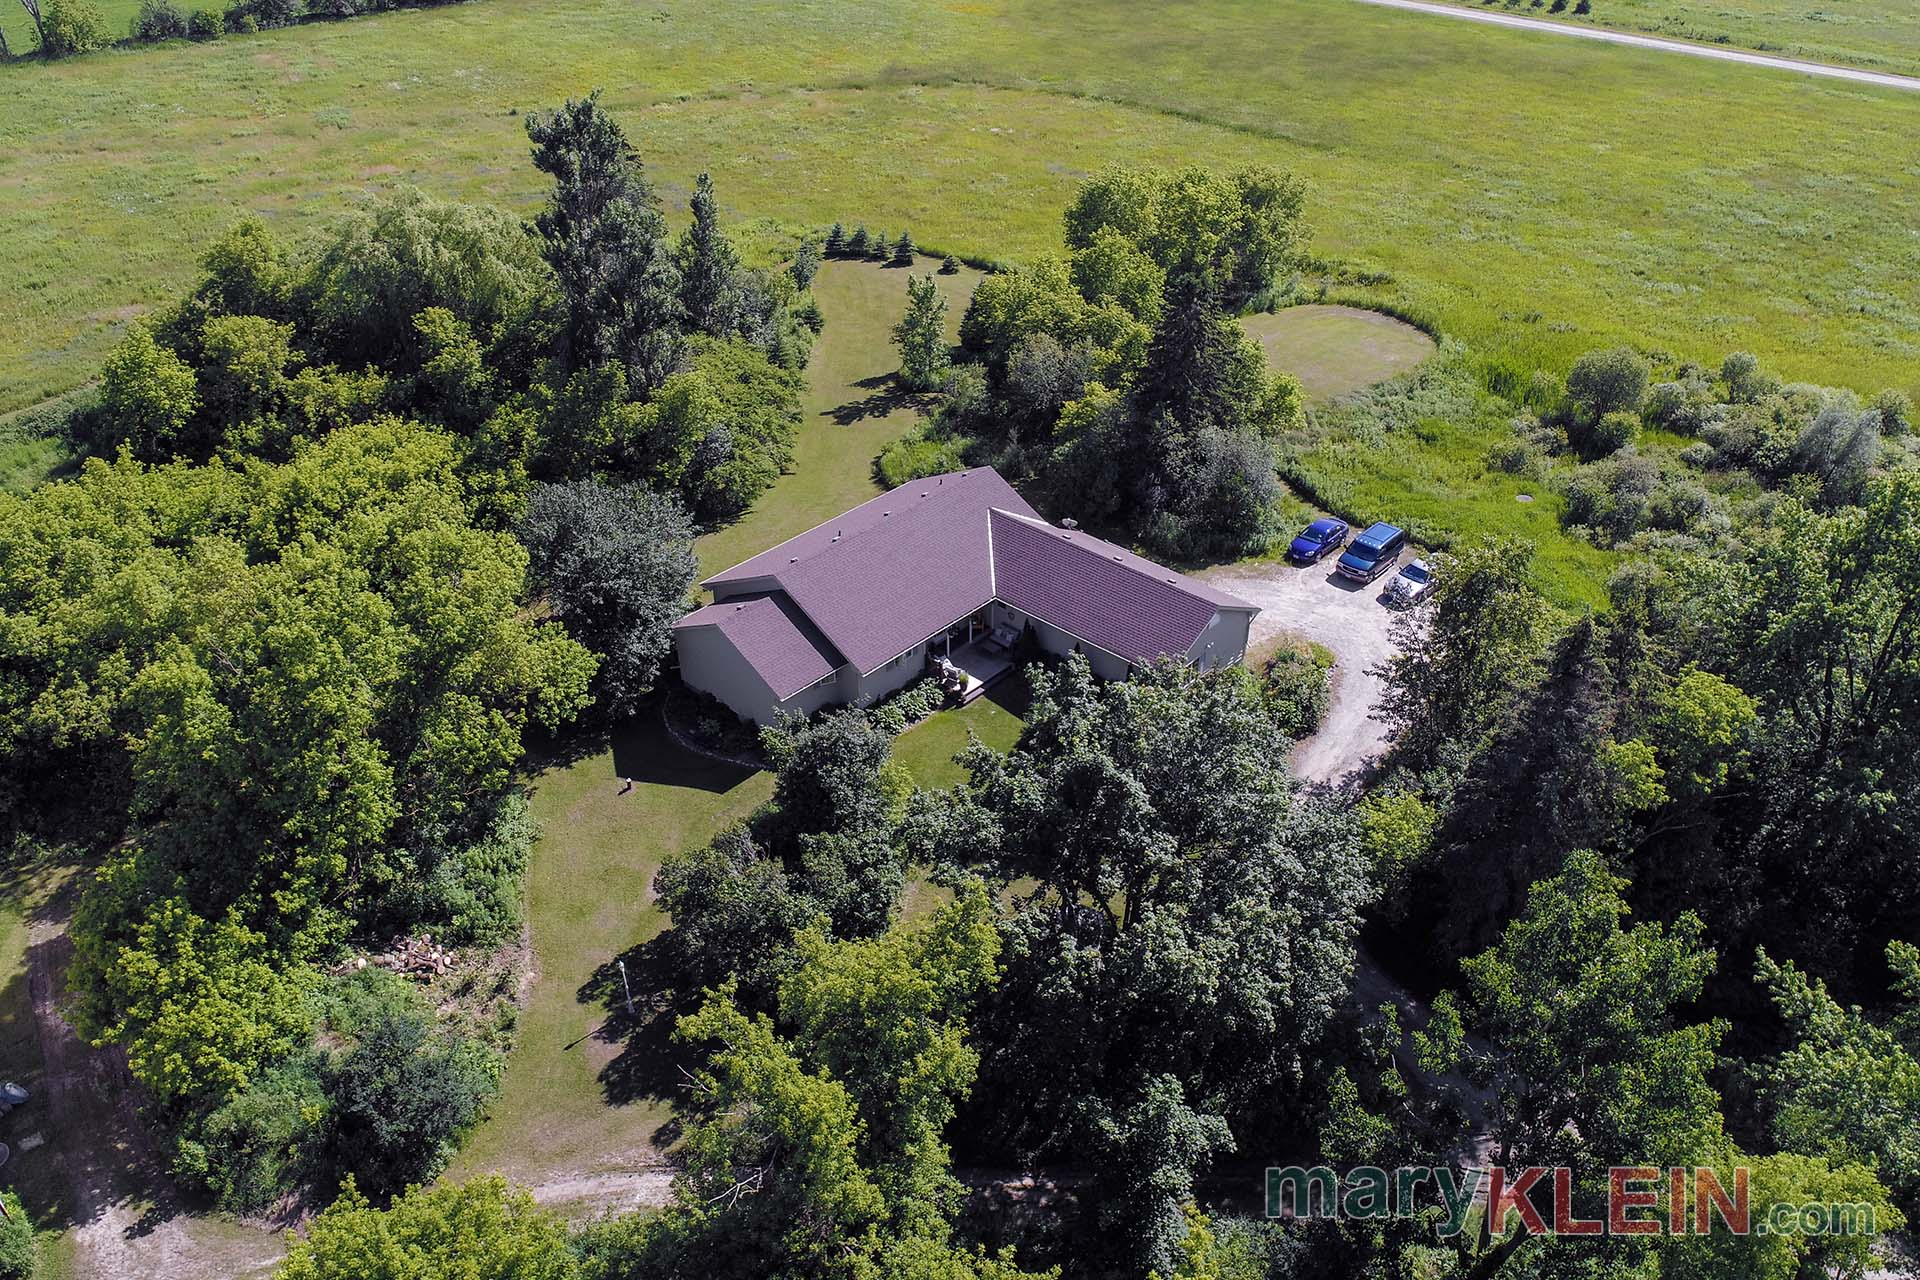 3 bedroom home for sale, orangeville